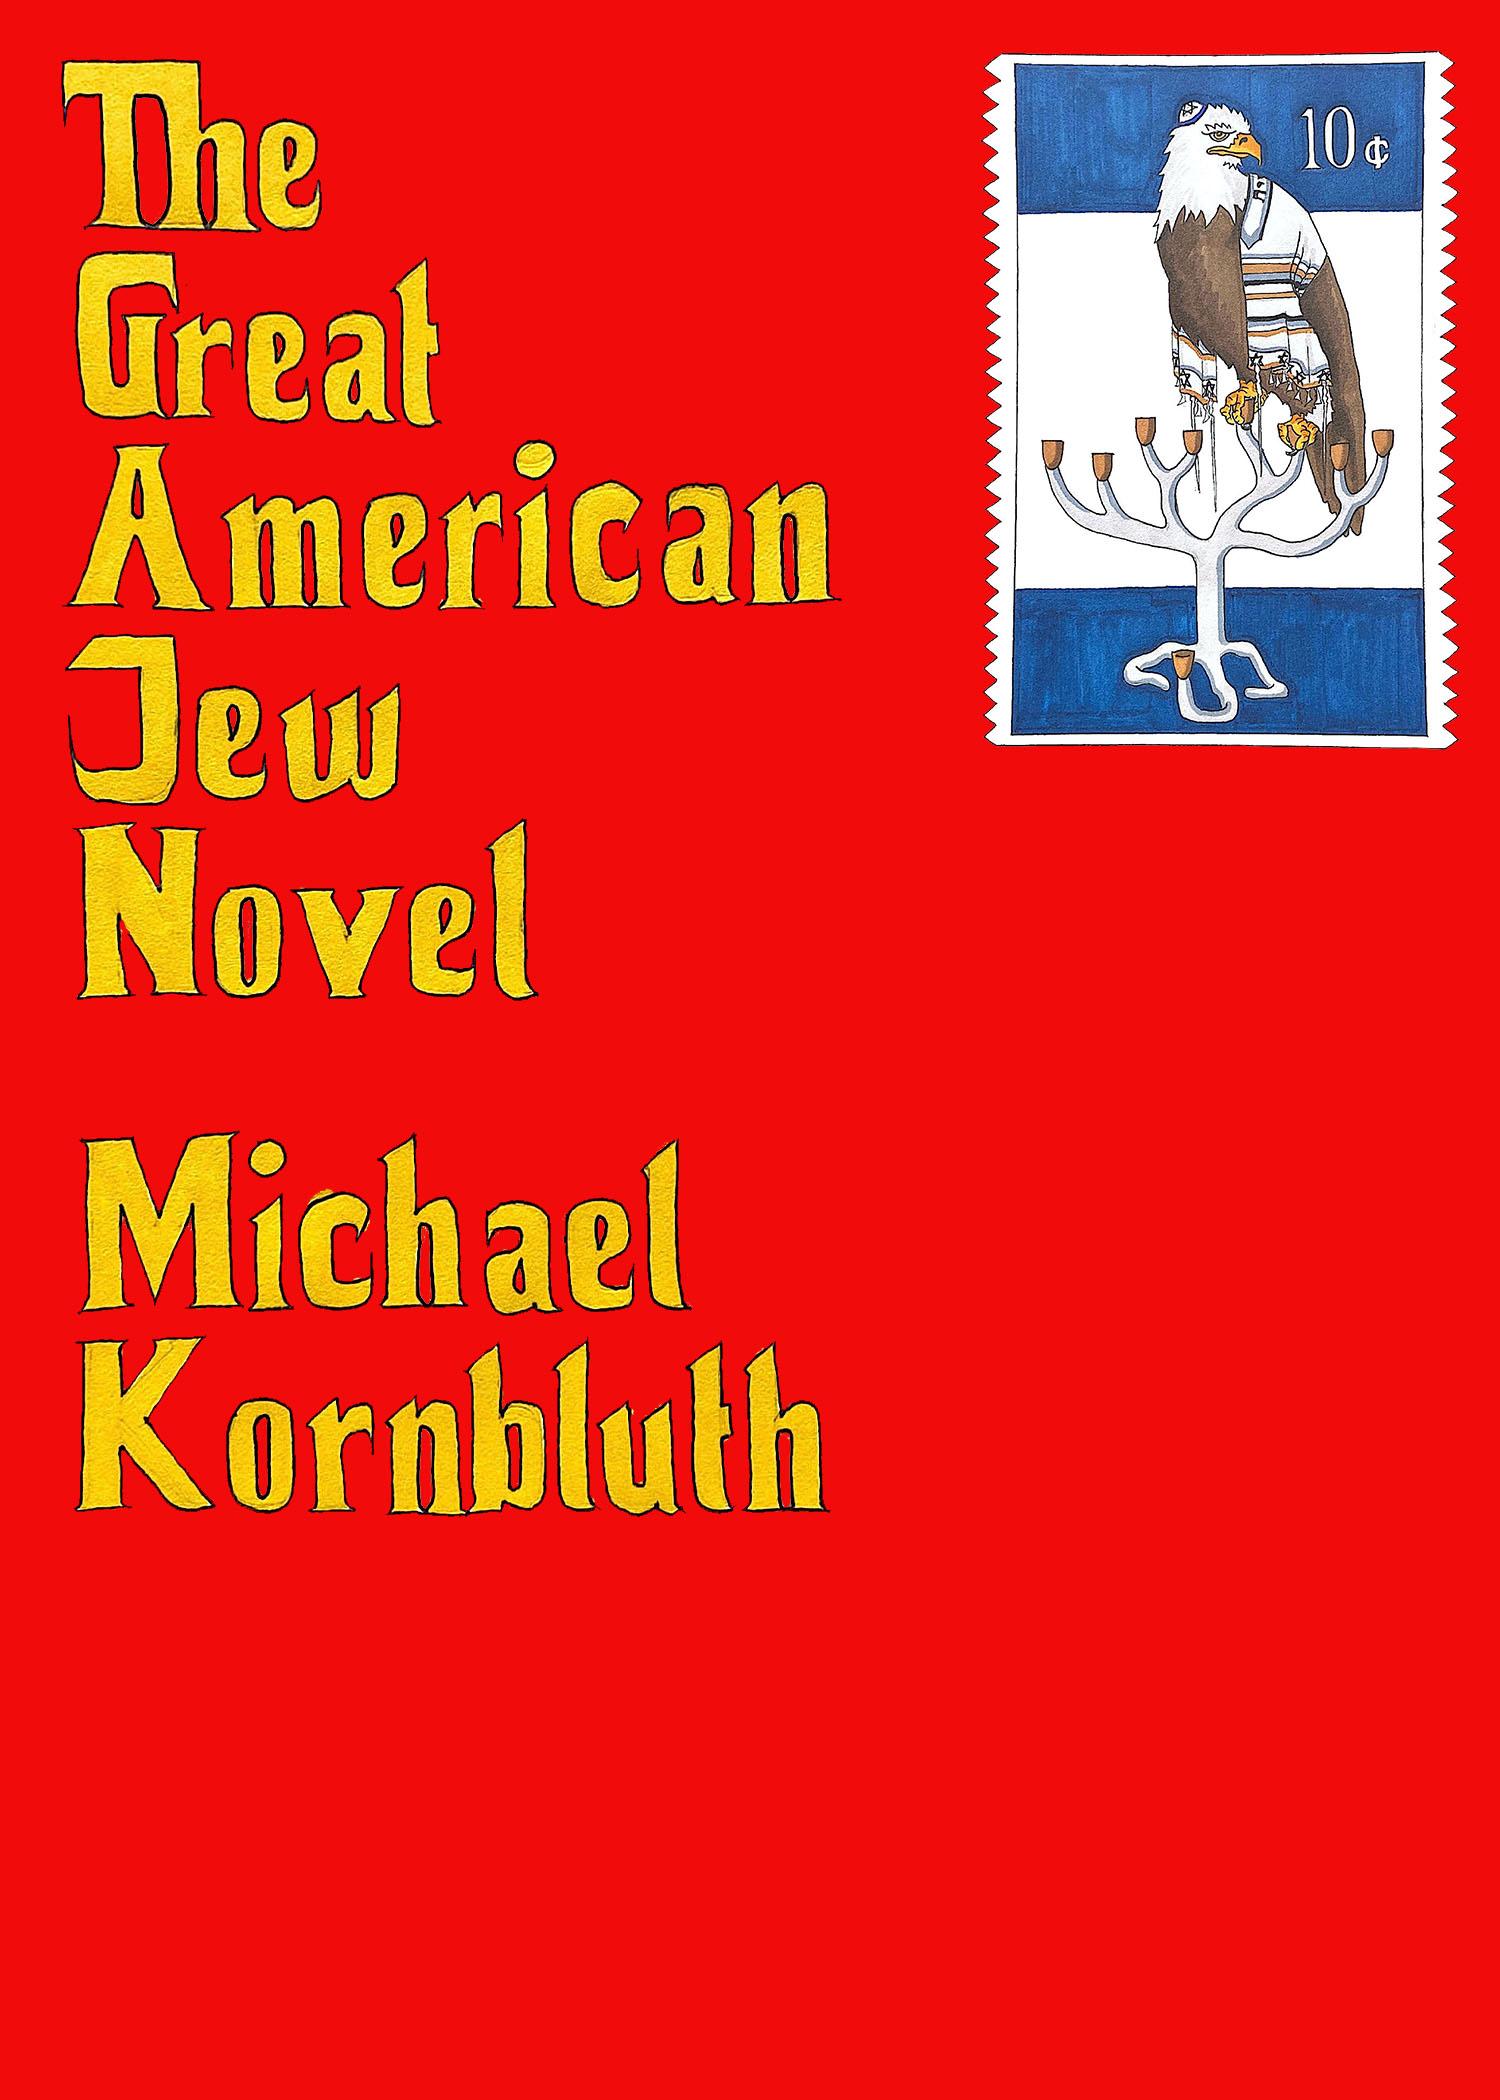 The Great American Jew Novel